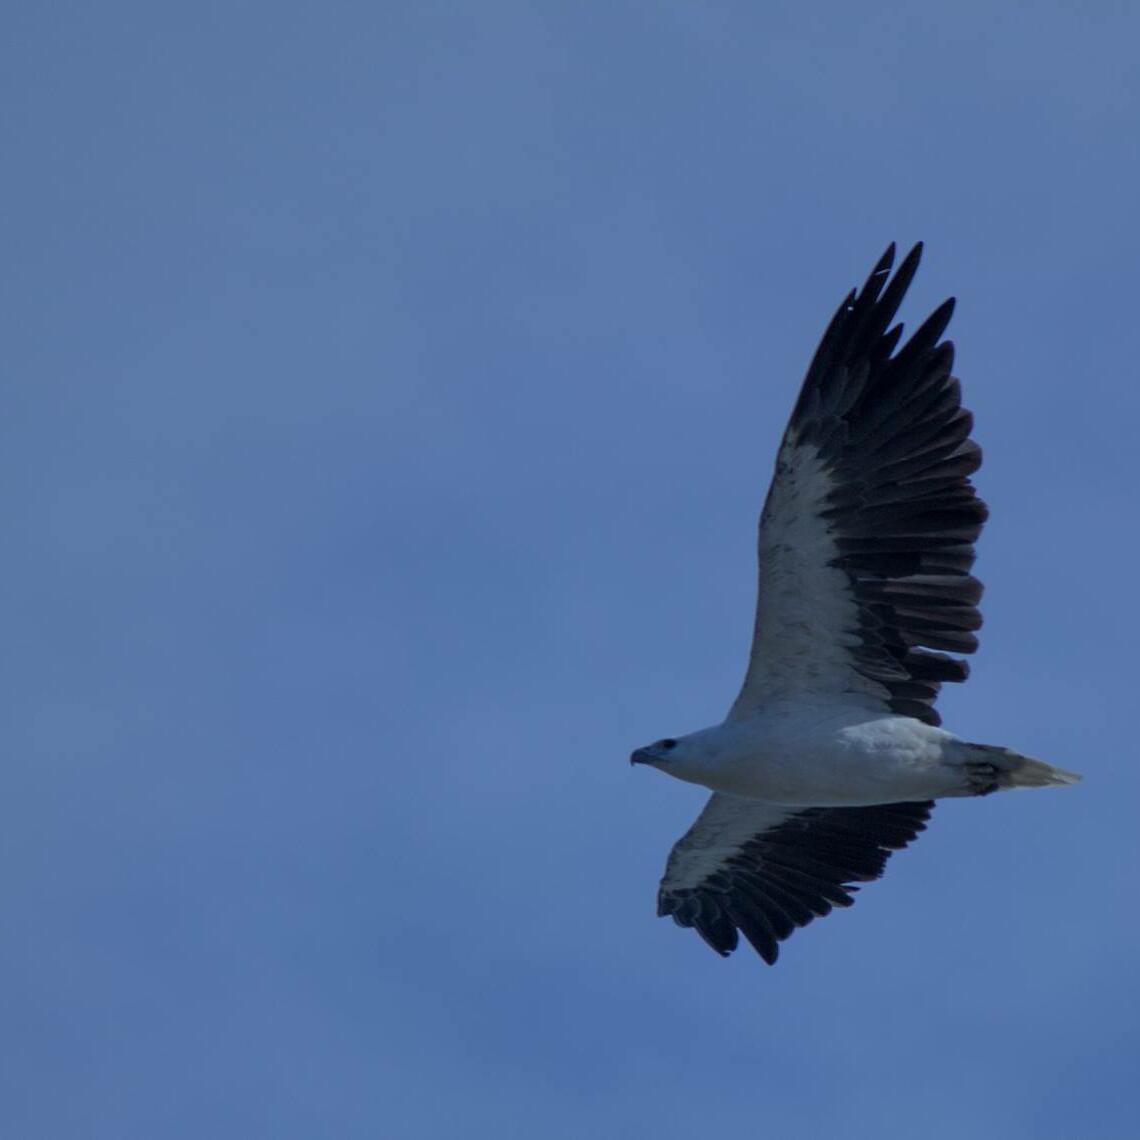 Condor bird flying in the sky near Strahan Village